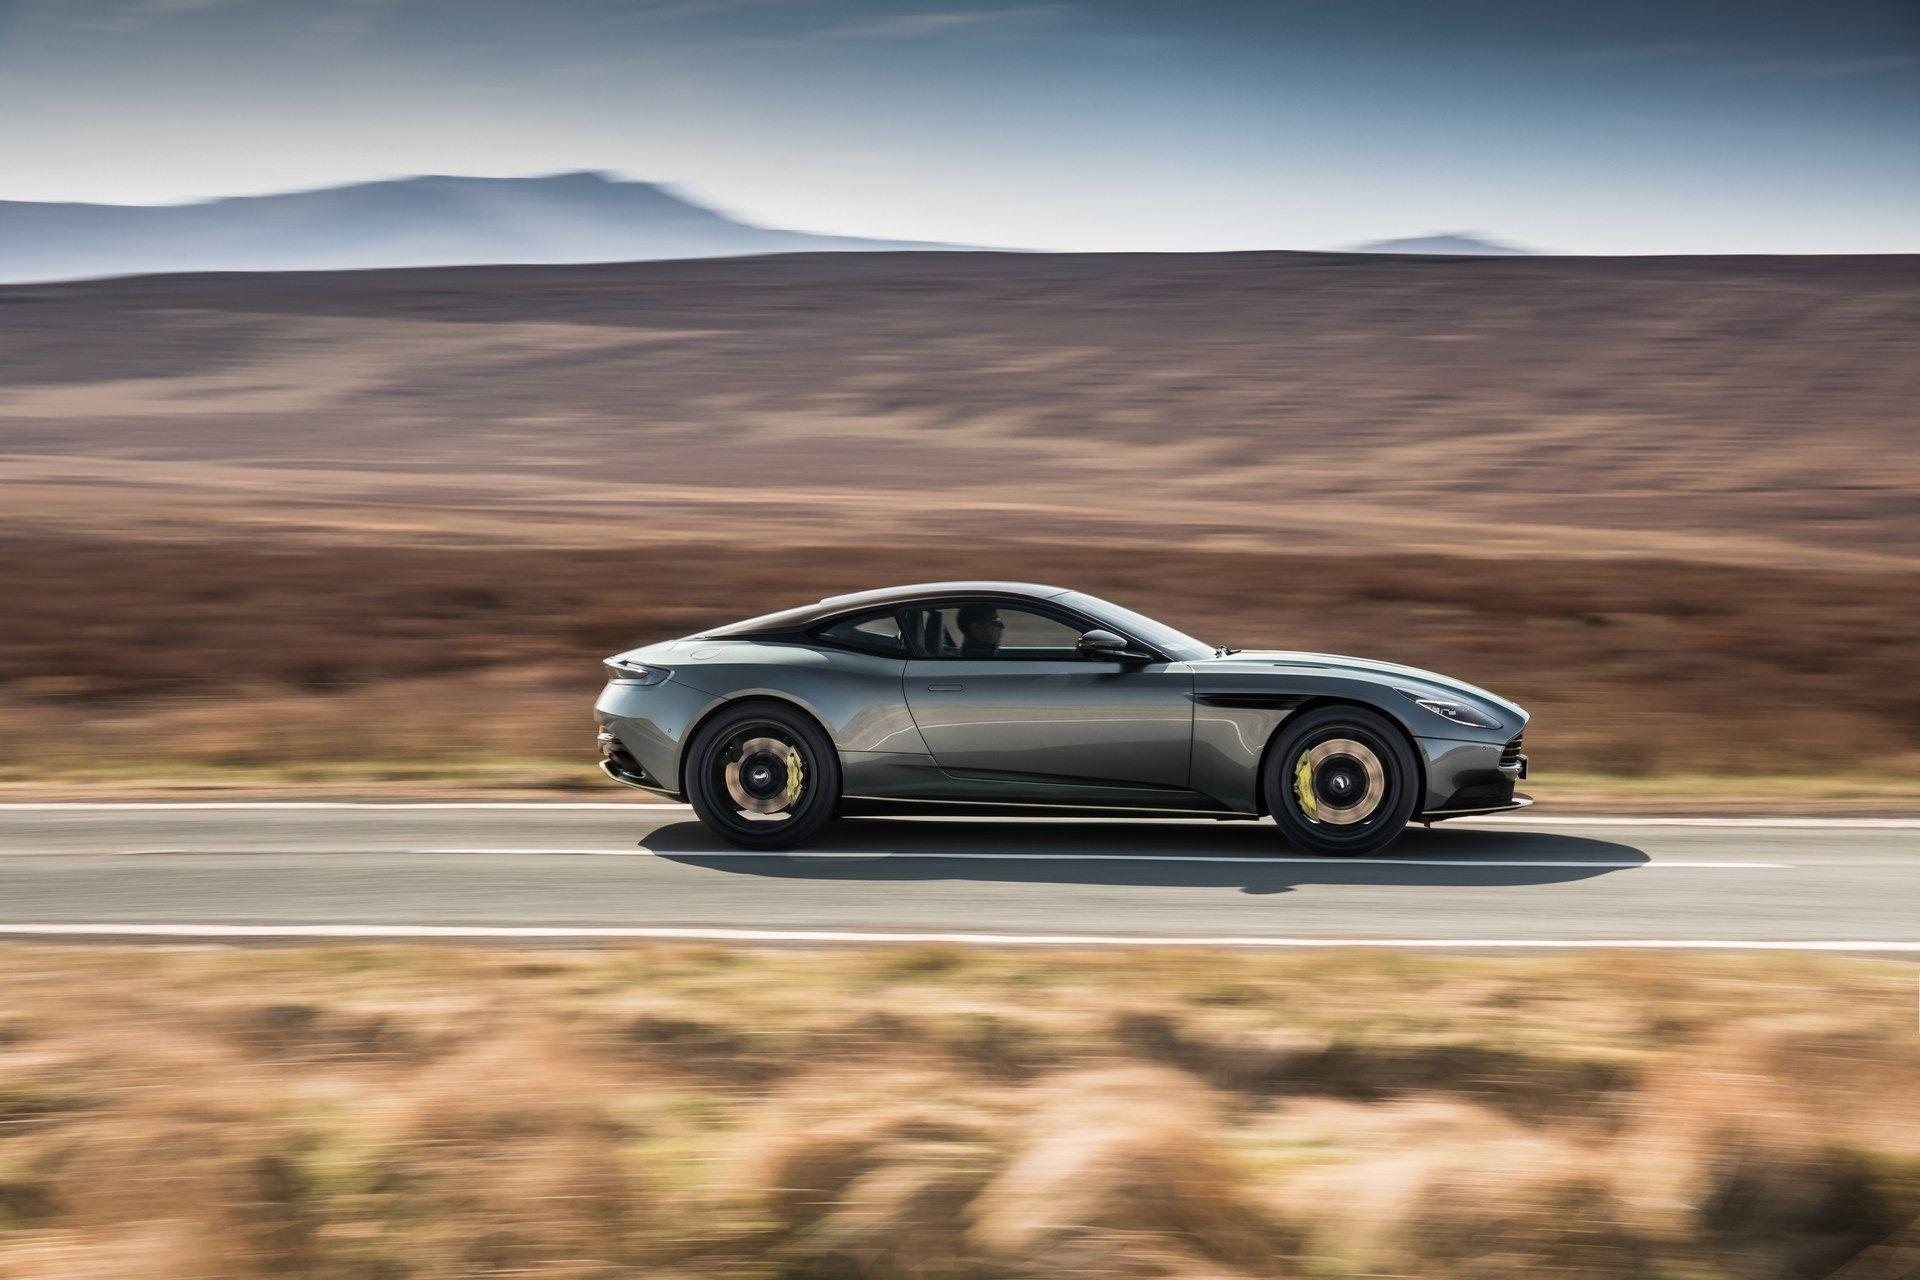 Aston-Martin-DB11-AMR-2